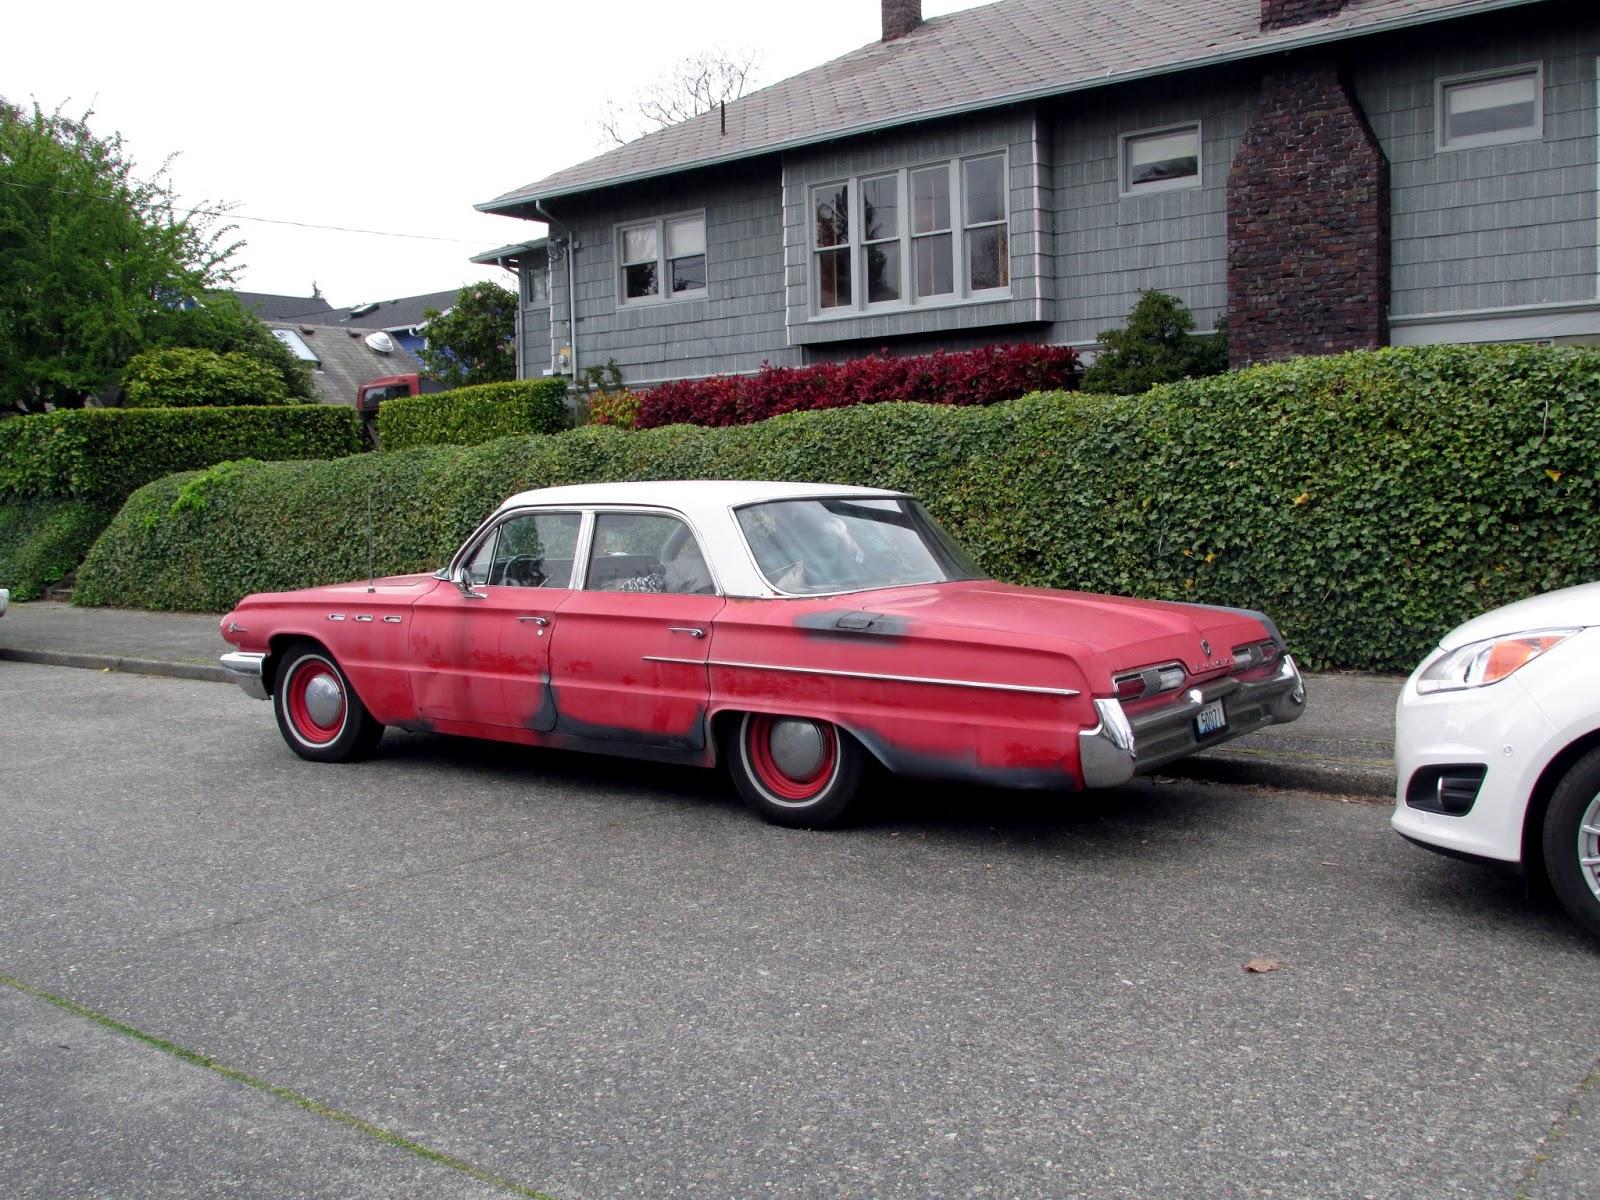 Seattle's Classics: 1962 Buick LeSabre Sedan